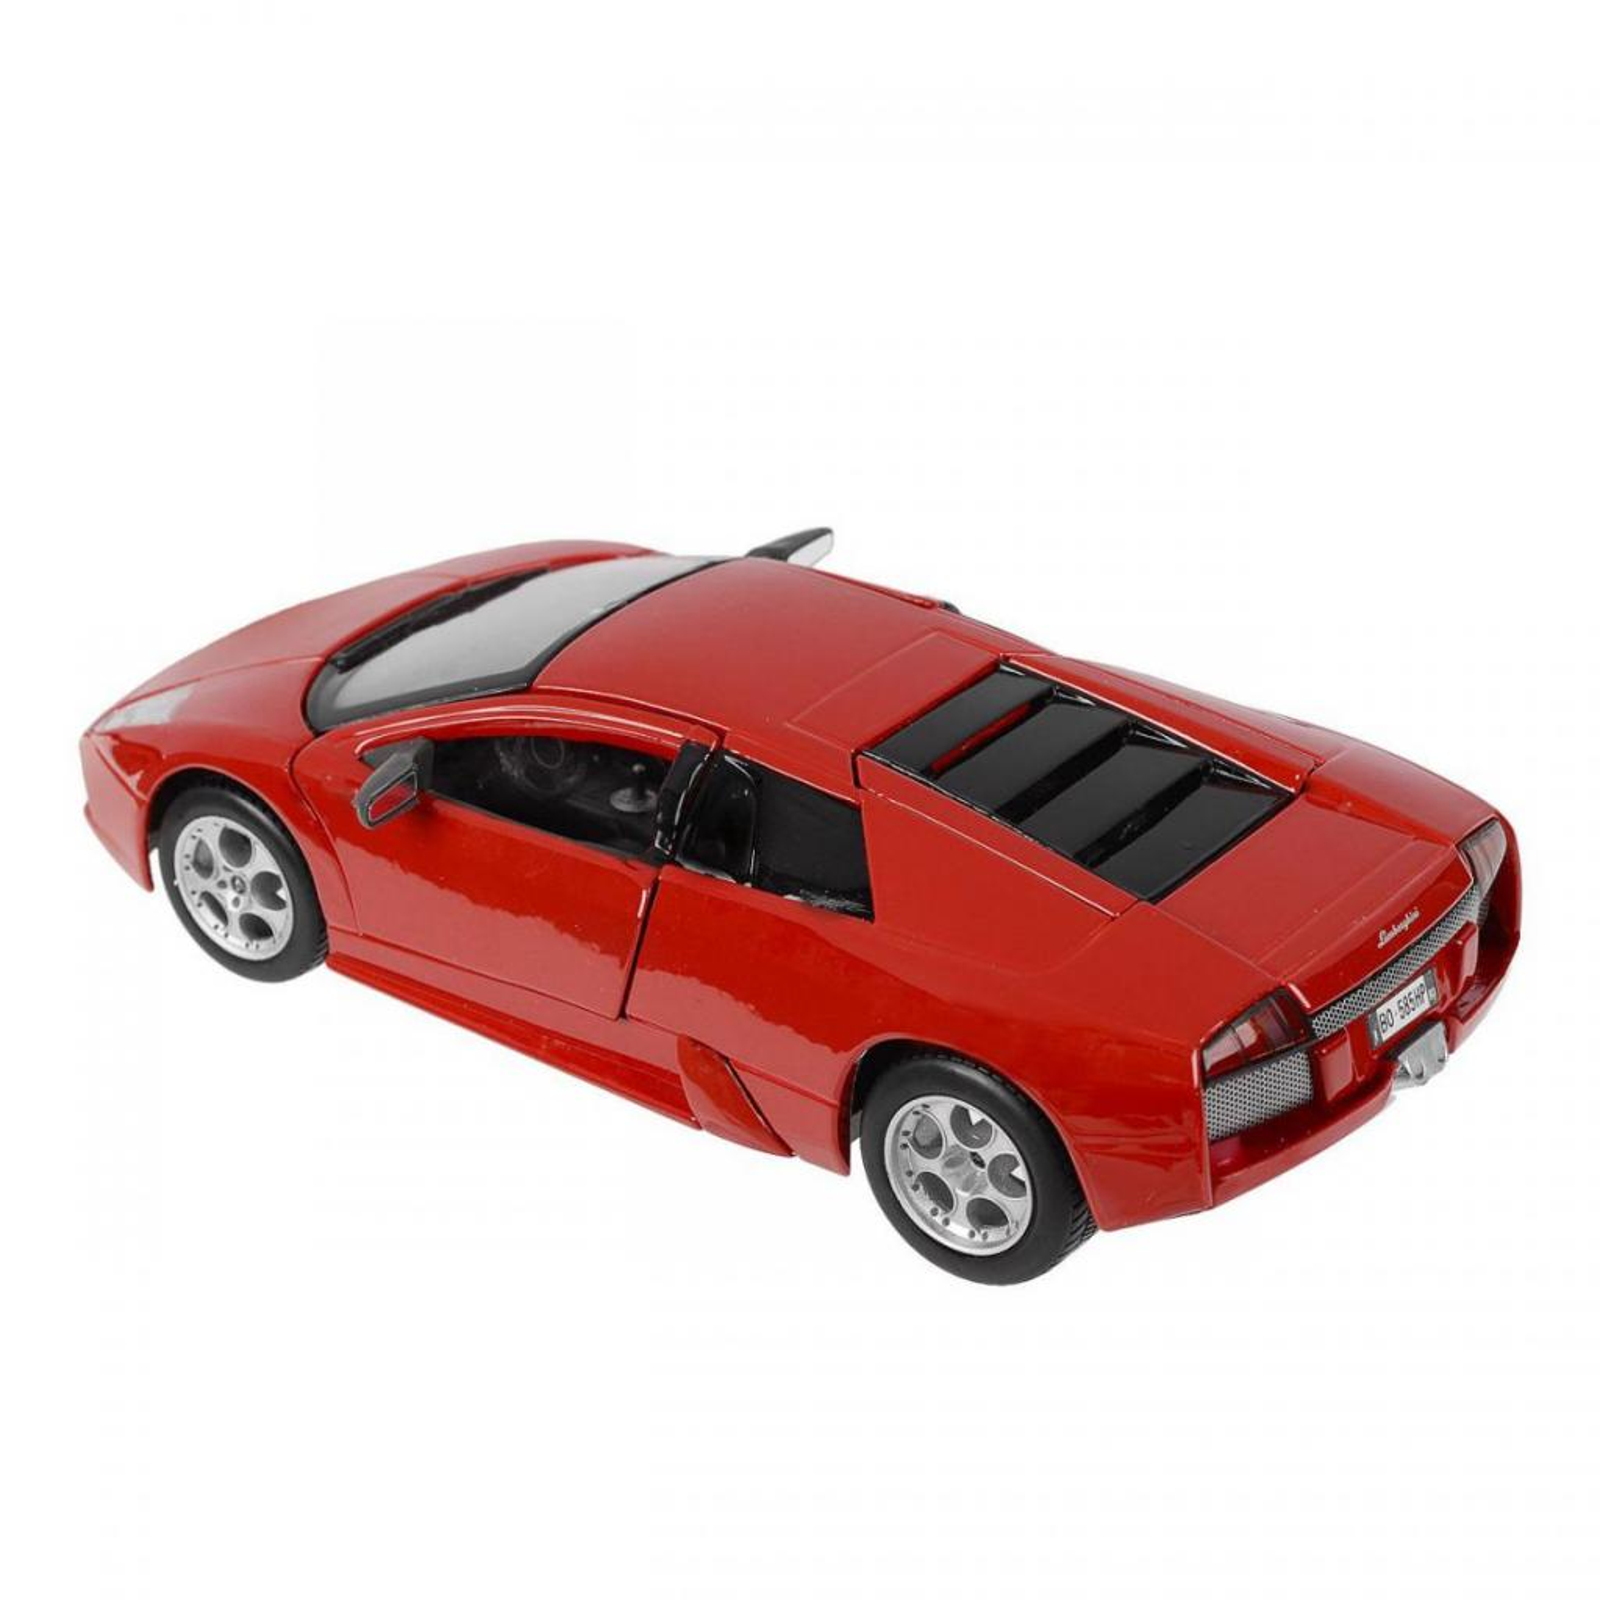 Машина Maisto Lamborghini Murcielago (1:24) красный металлик (31238 red) изображение 2